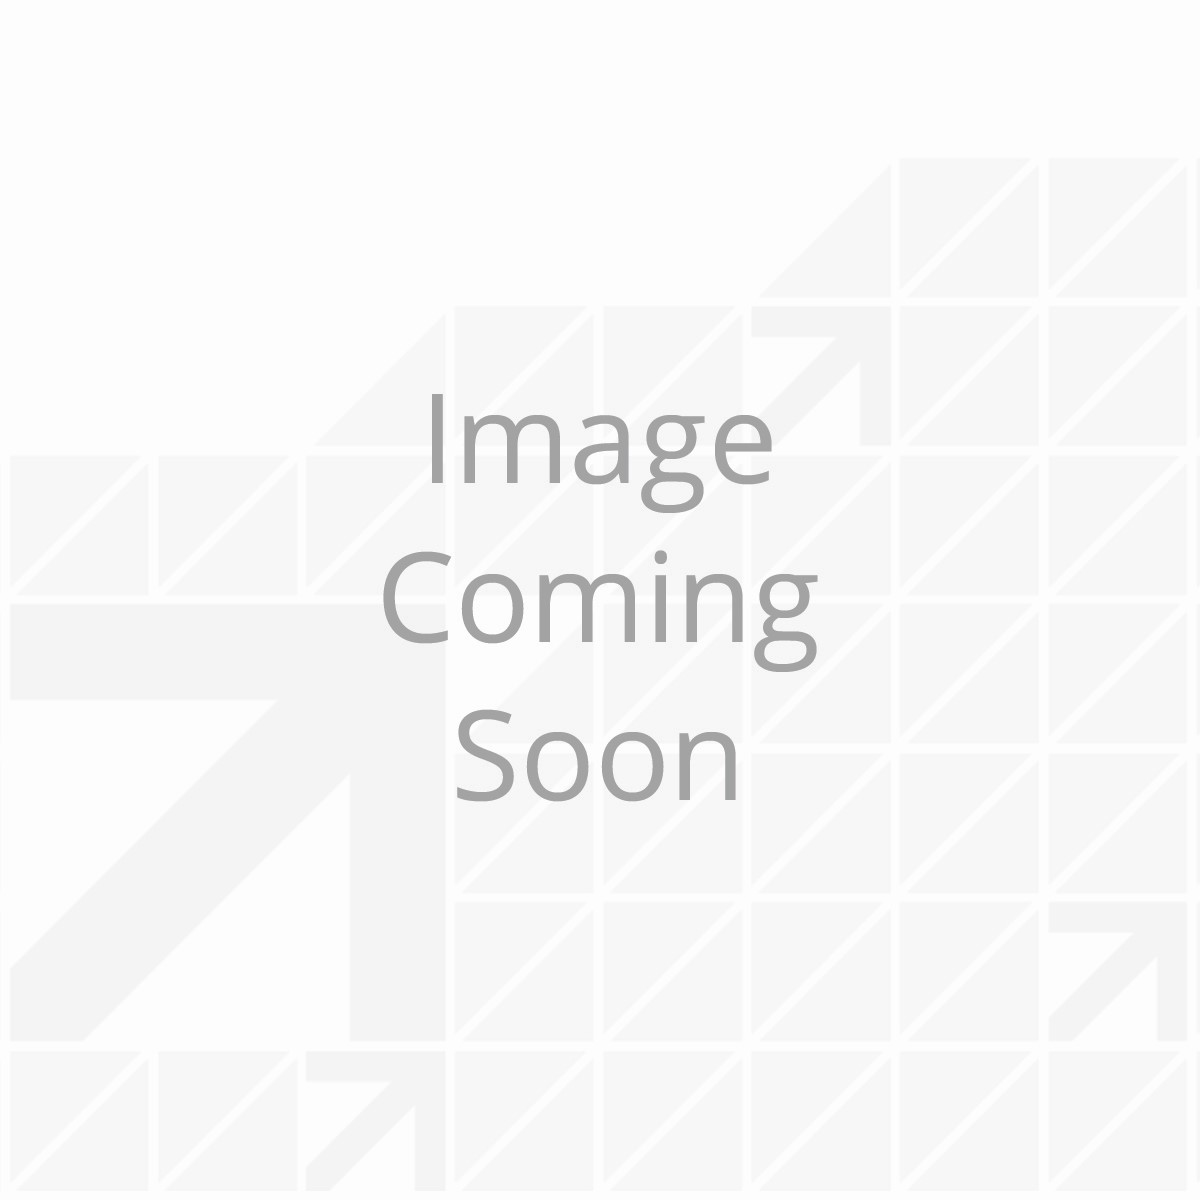 433467_-_14k_hydraulic_jack_-_001